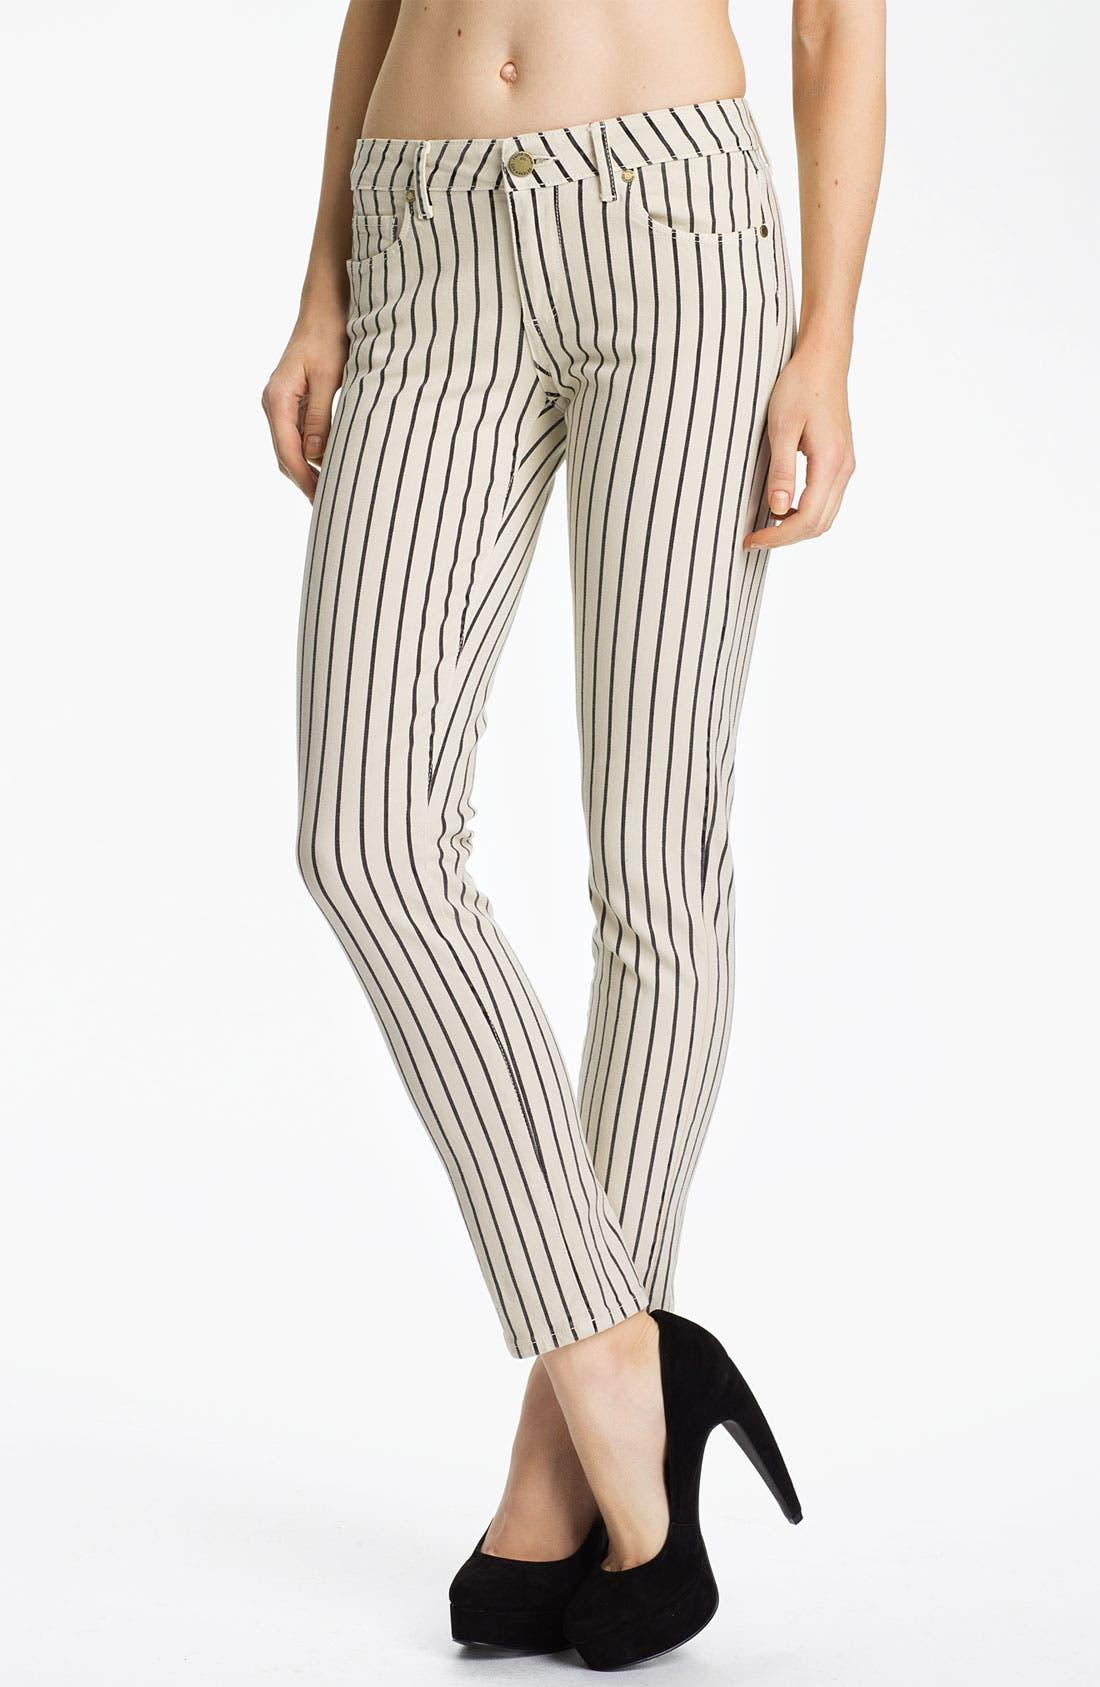 Alternate Image 1 Selected - Paige Denim 'Skyline' Ankle Peg Stripe Skinny Jeans (Birch/Black)